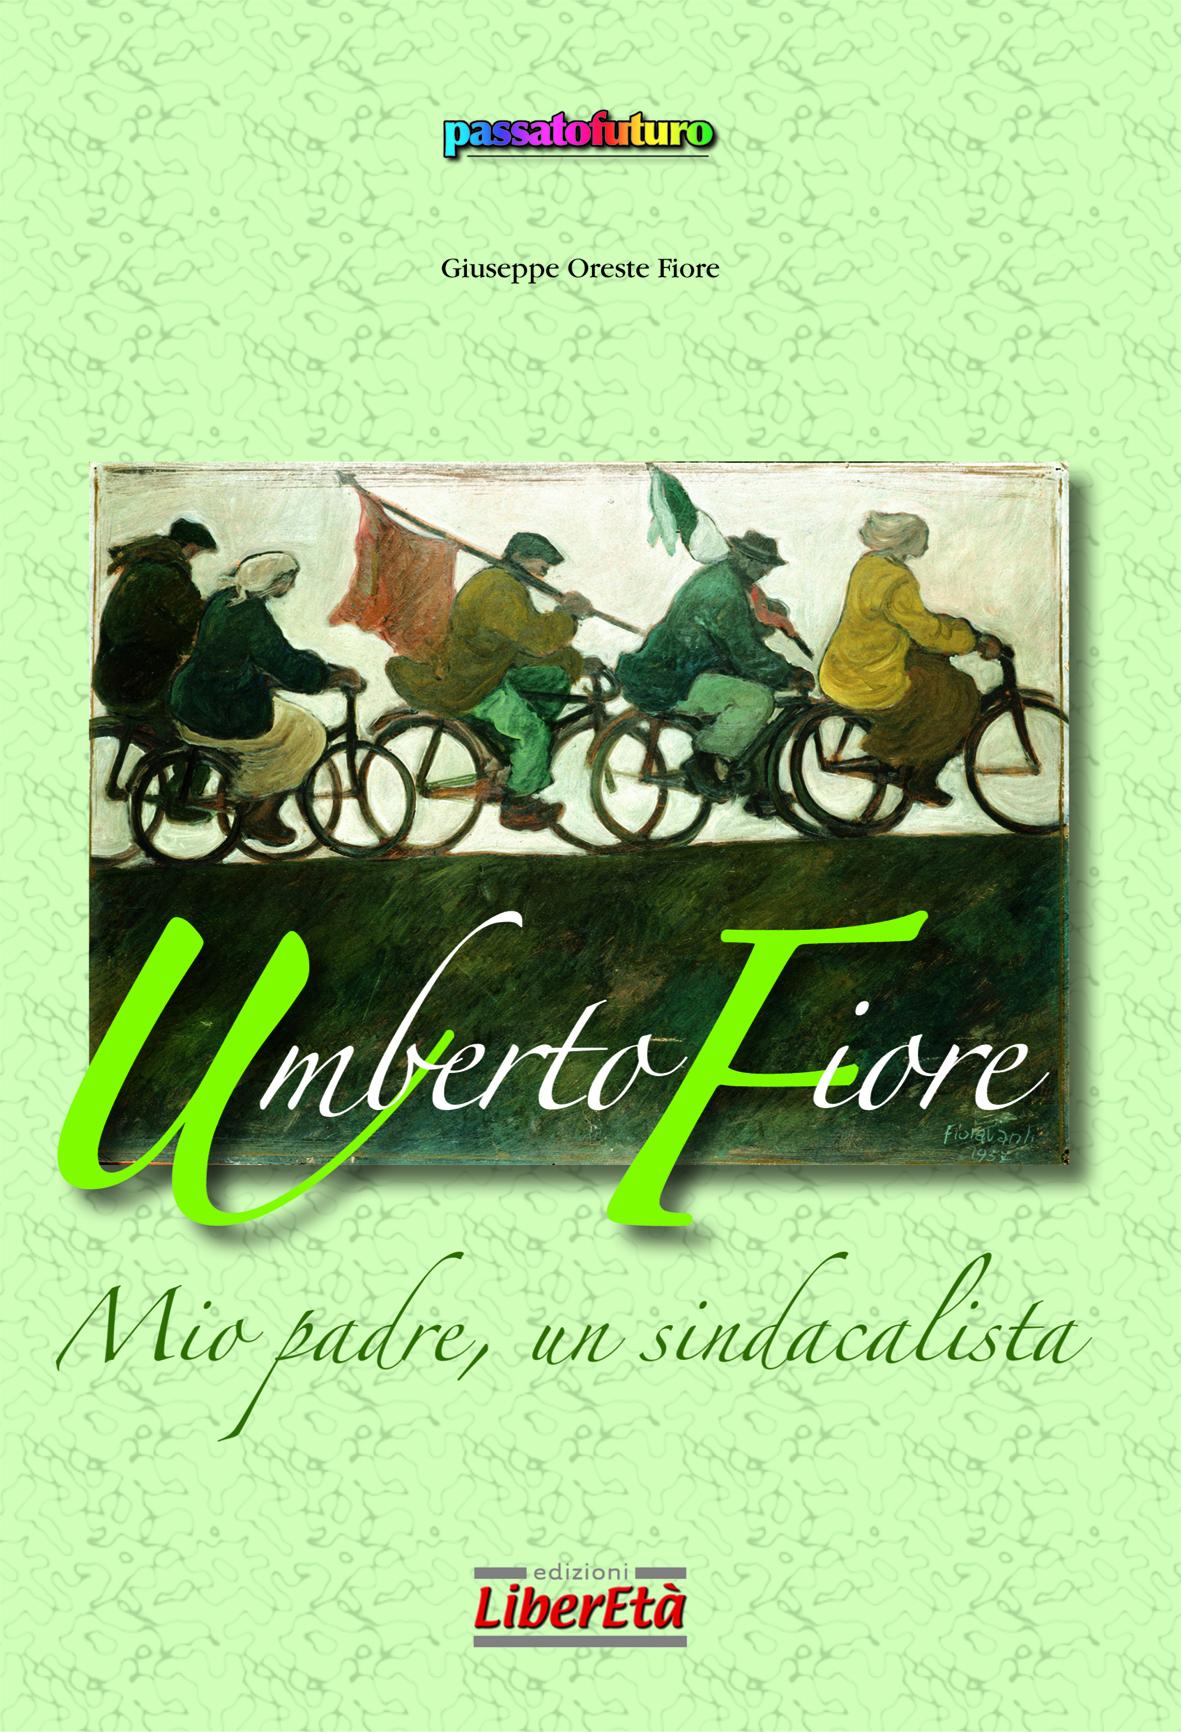 Umberto Fiore - Mio padre, un sindacalista